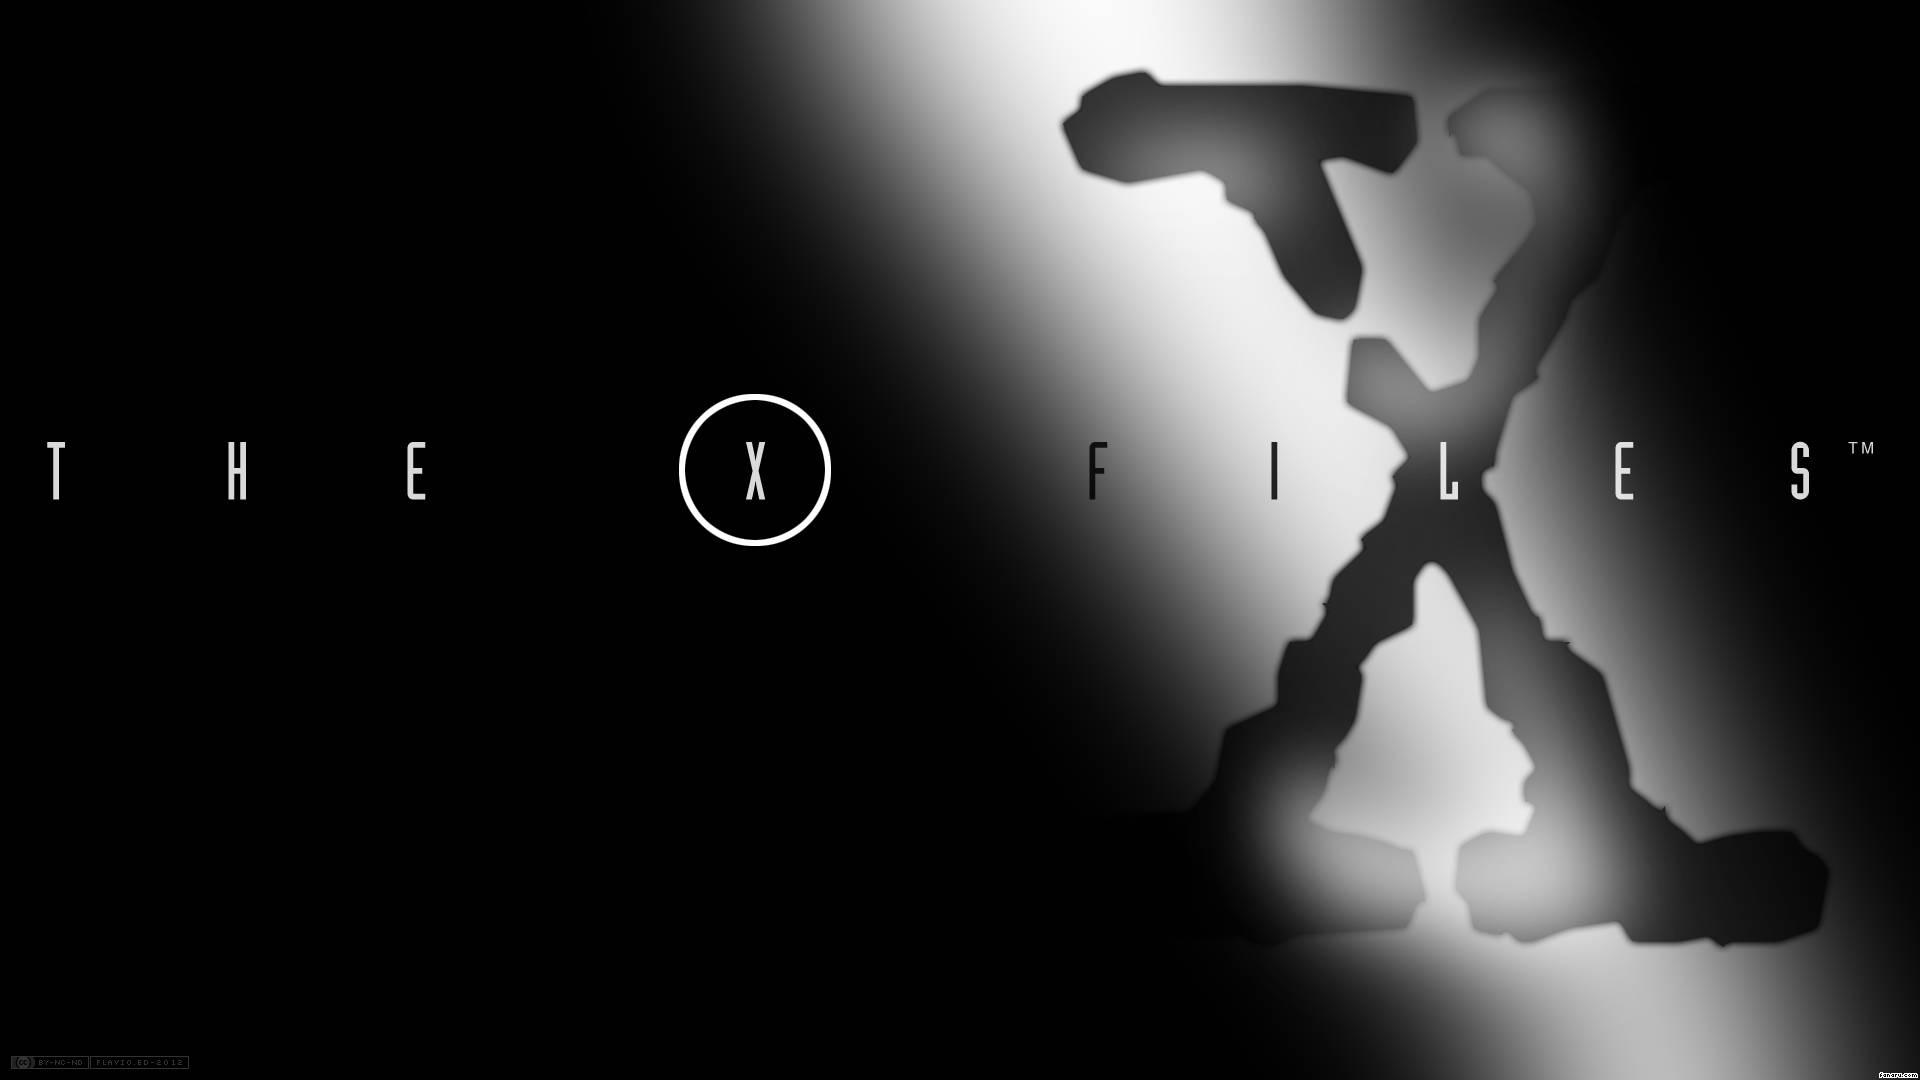 the-x-files-text-logo